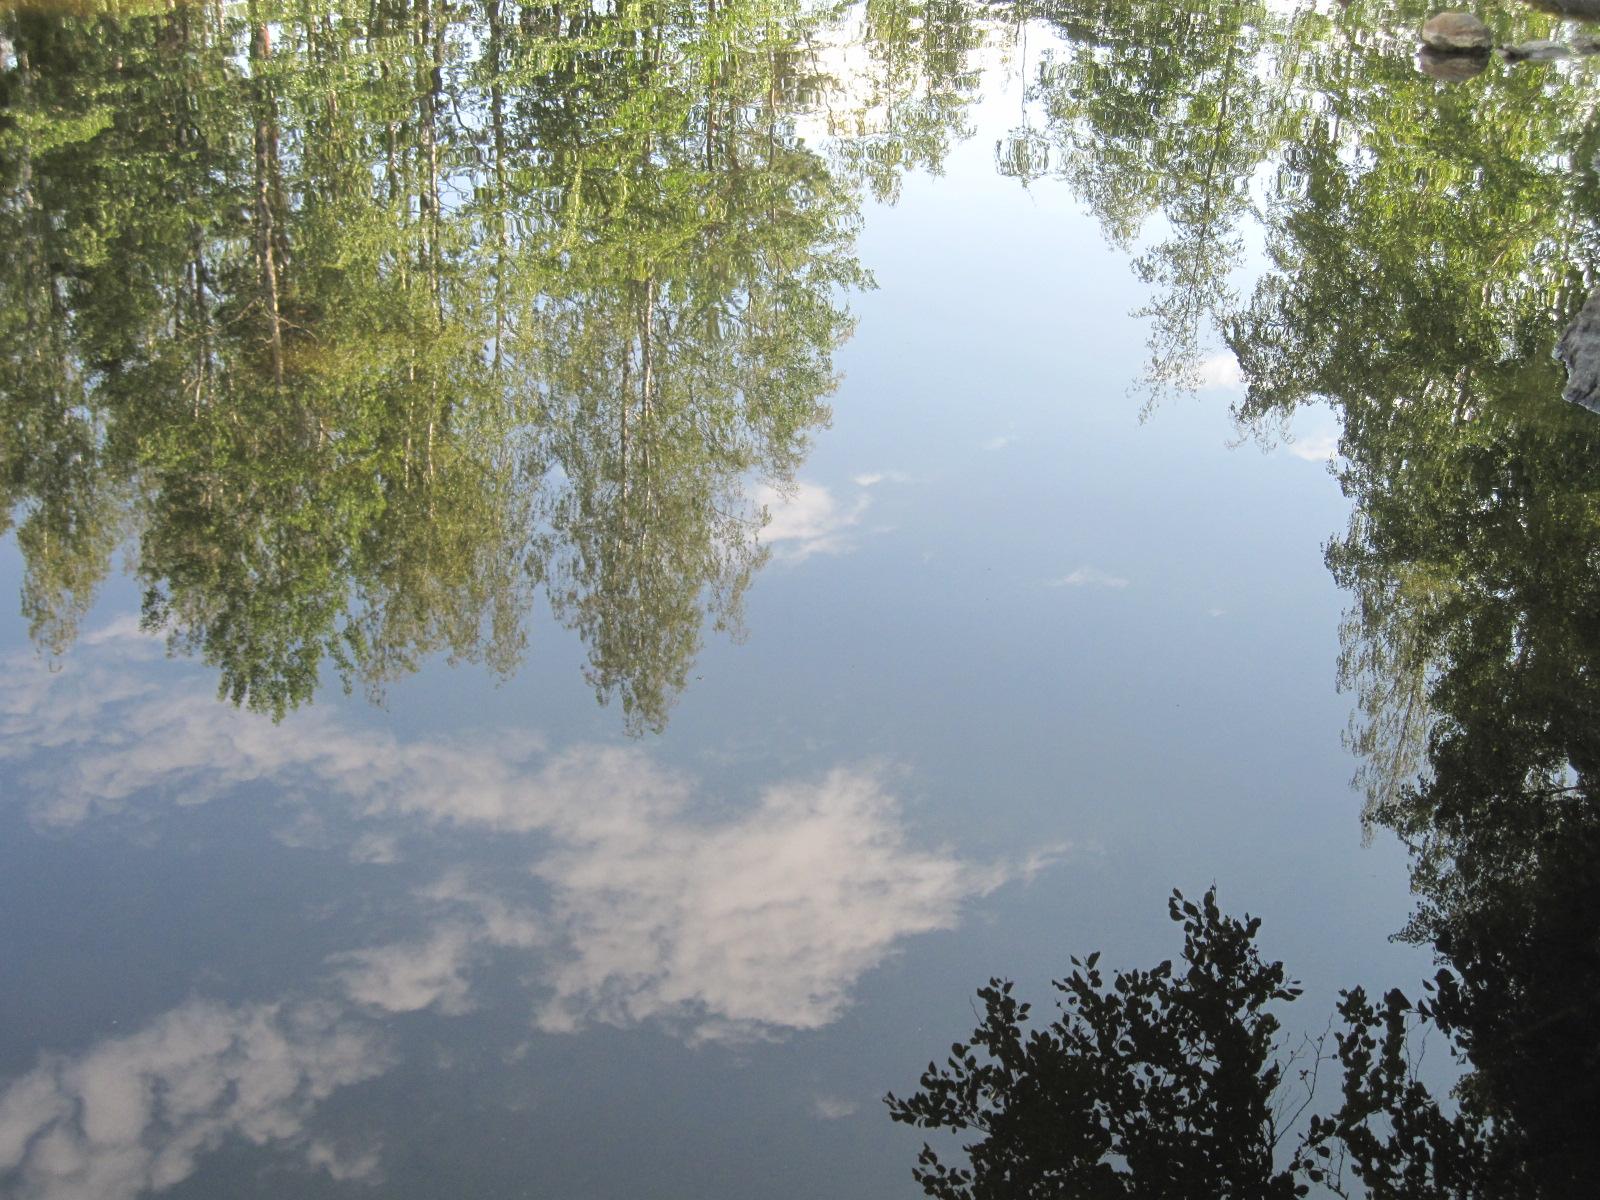 Järven pintaan heijastuvia puita.